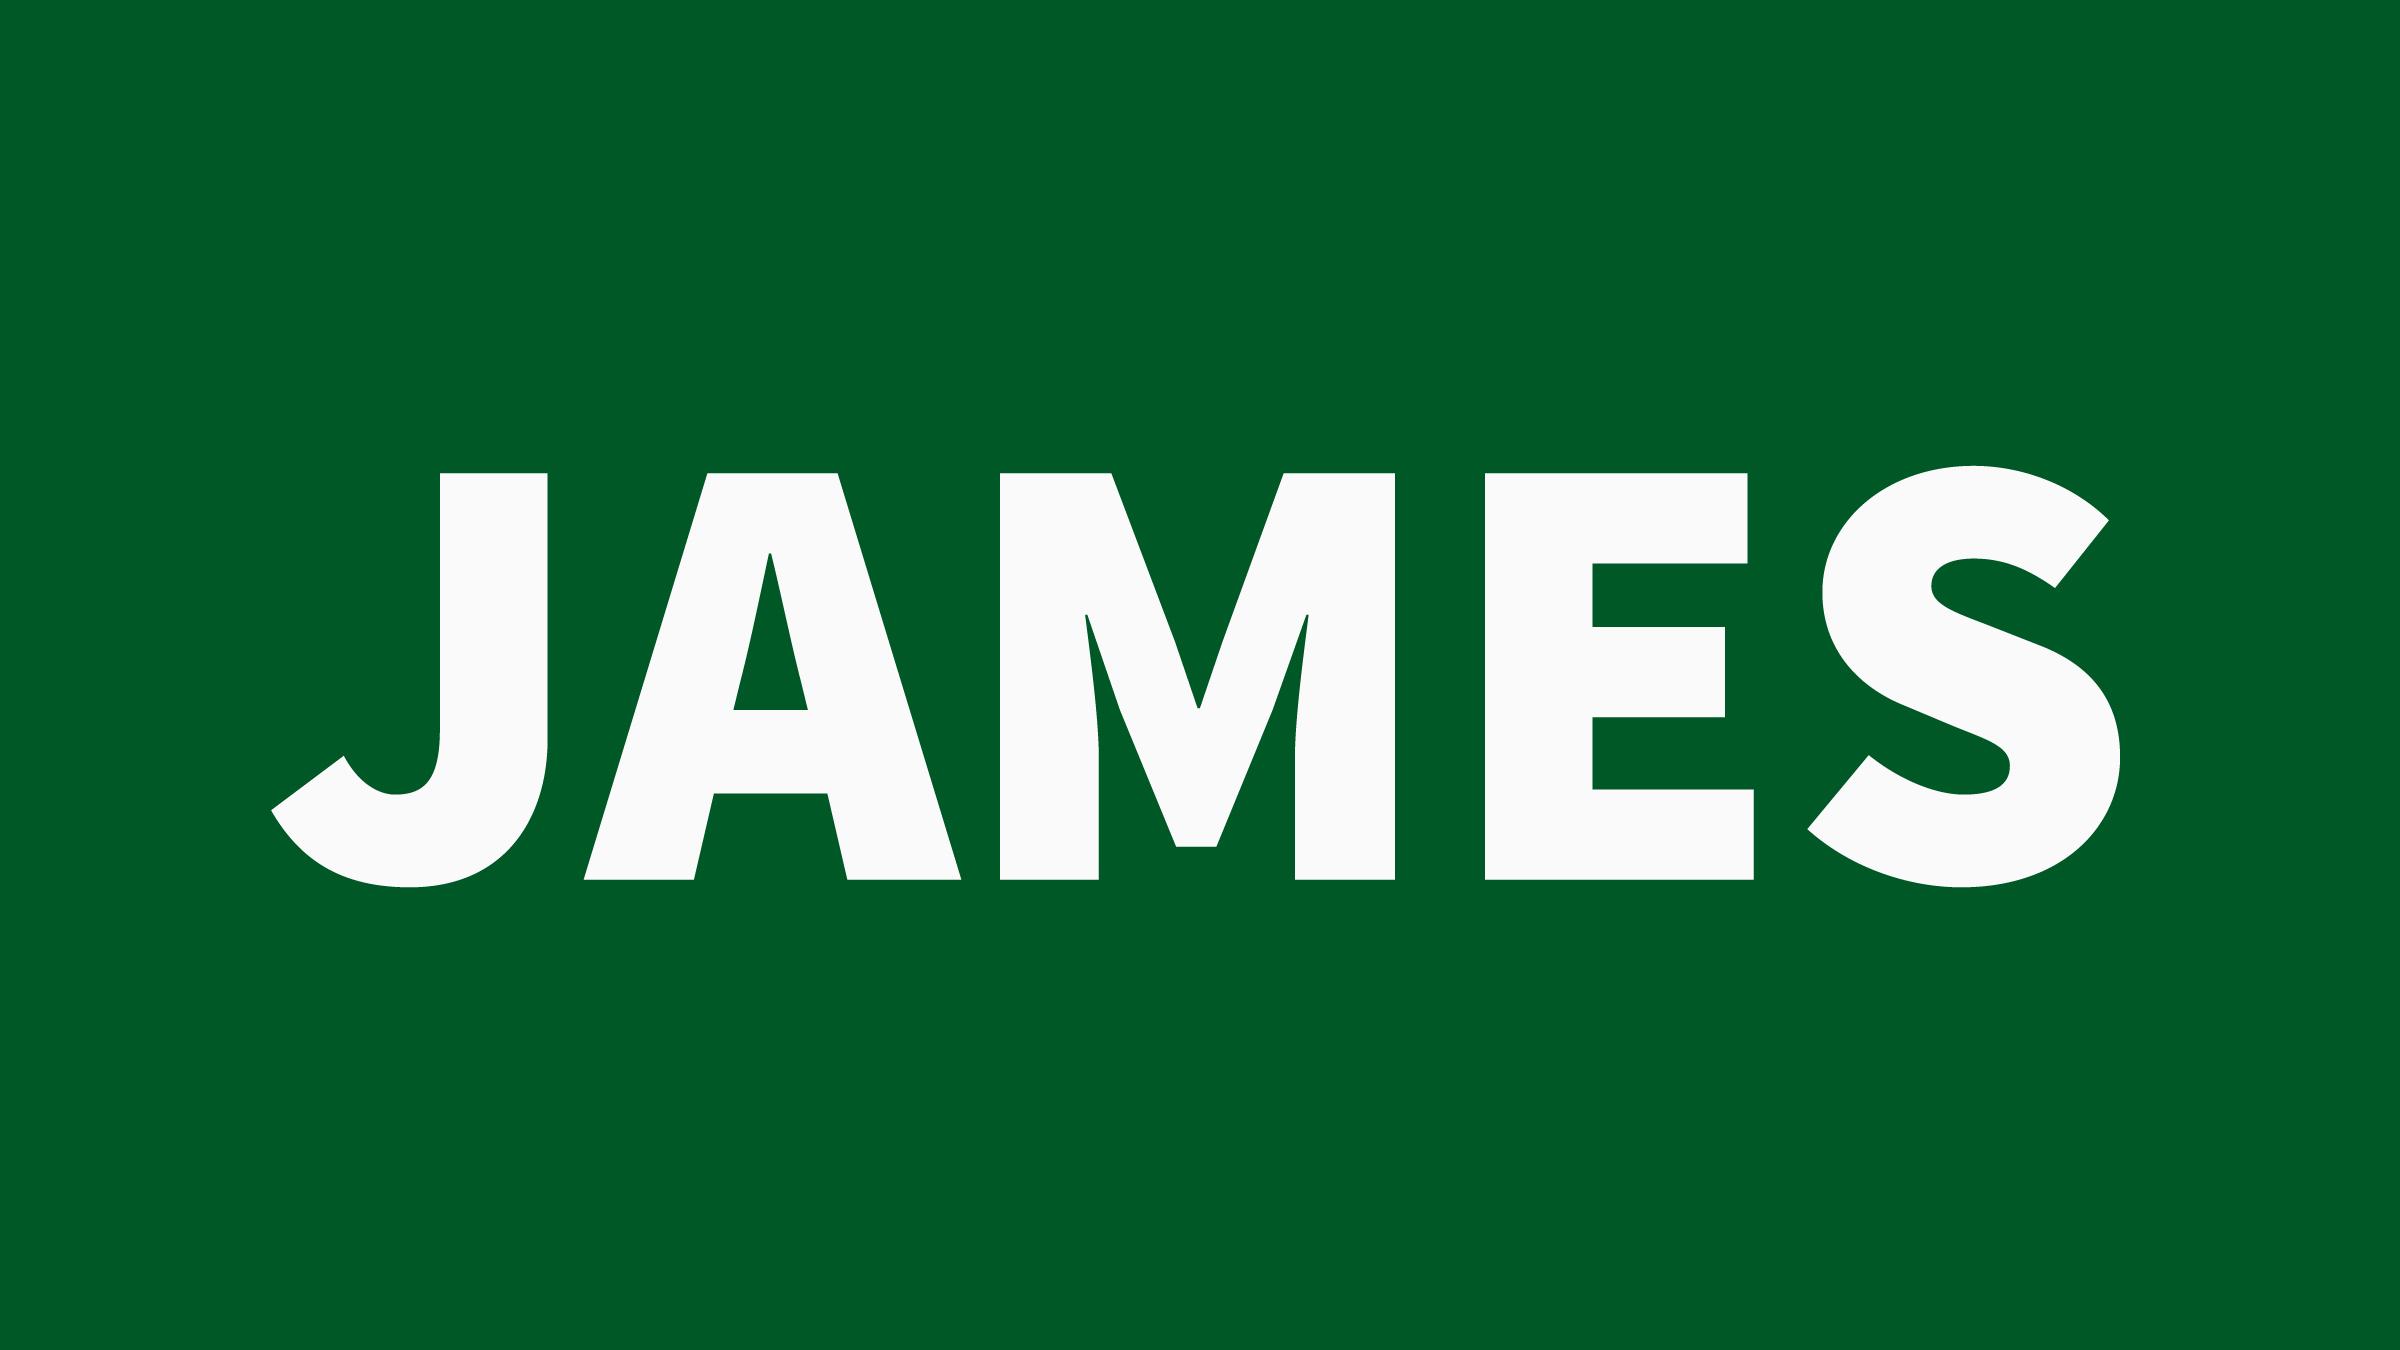 James.jpg